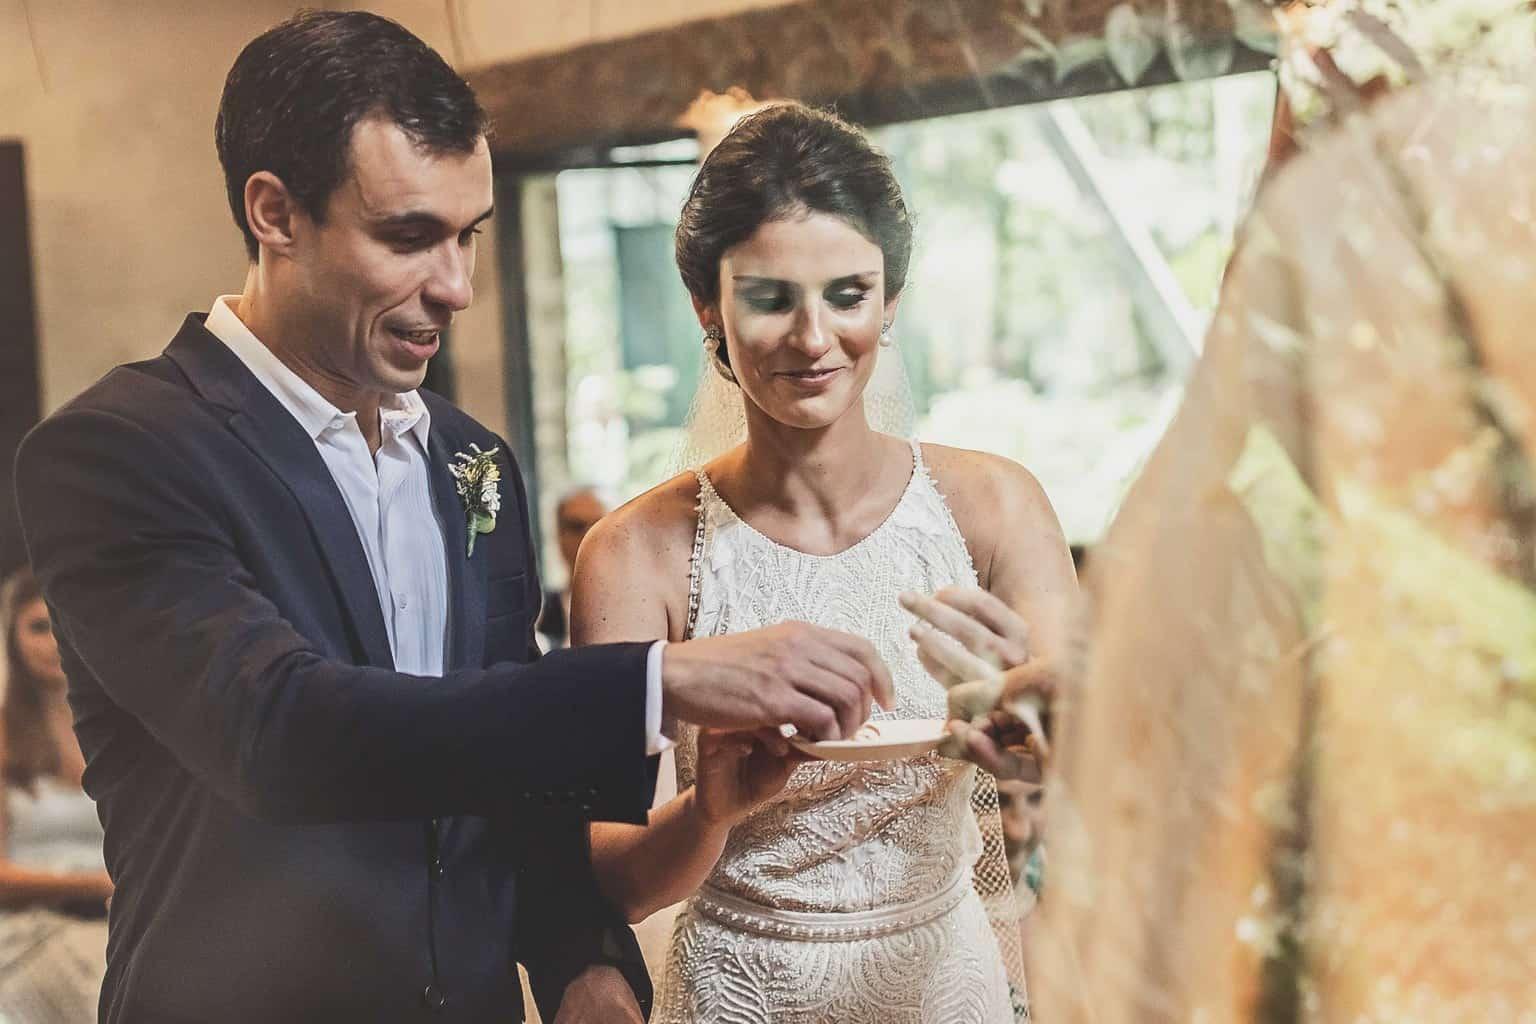 casamento-Ana-Cecilia-e-Leonardo-casamento-na-serra-cerimonia-graviola-filmes-graviolafilmes-laura-camapnella-de-siervi-lauracampanella-studio-laura-camapnella21